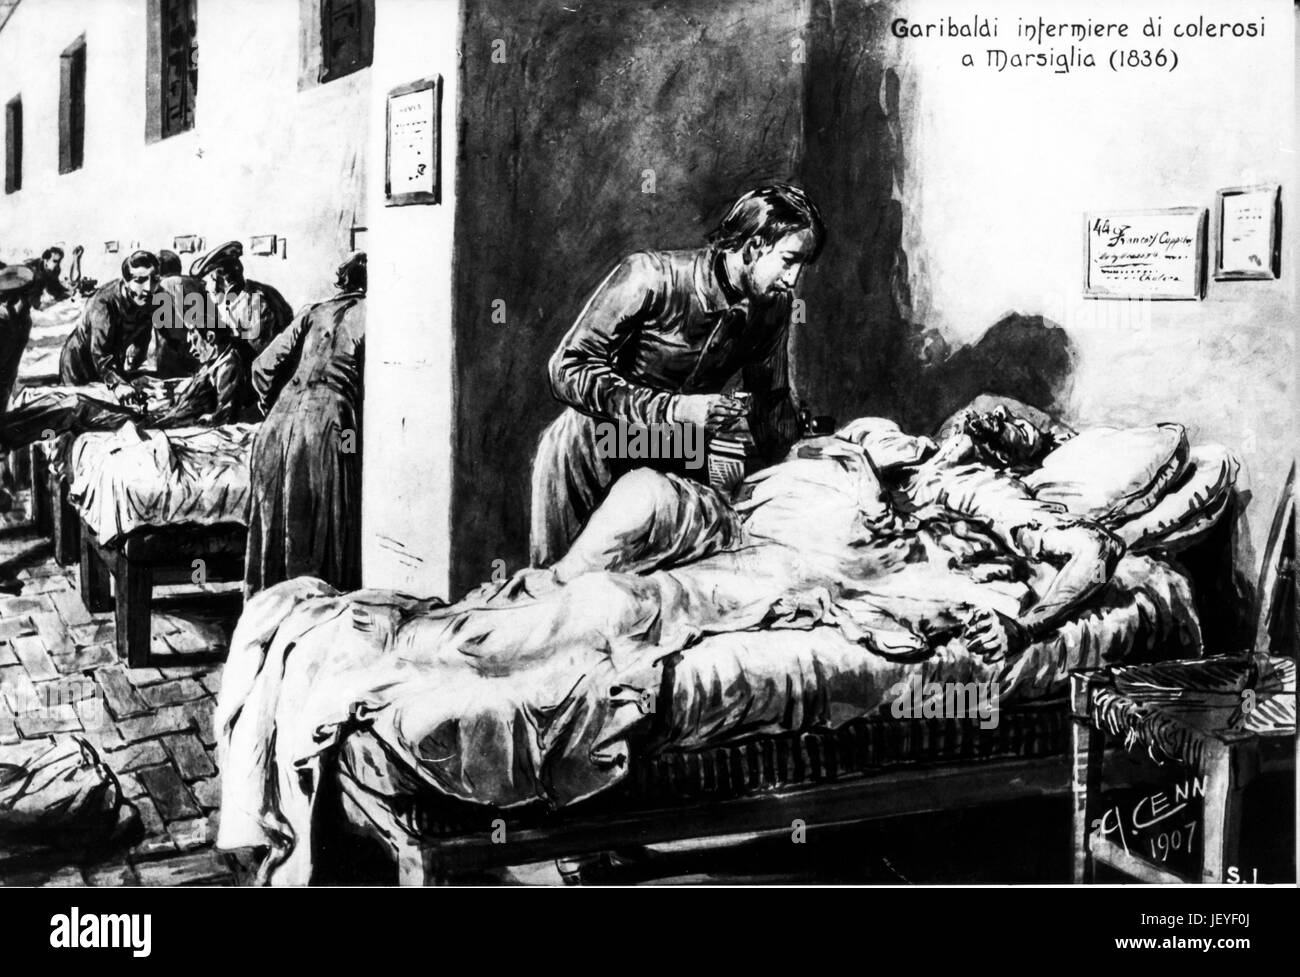 Giuseppe garibaldi nursing colonists in marsiglia, 1836 - Stock Image